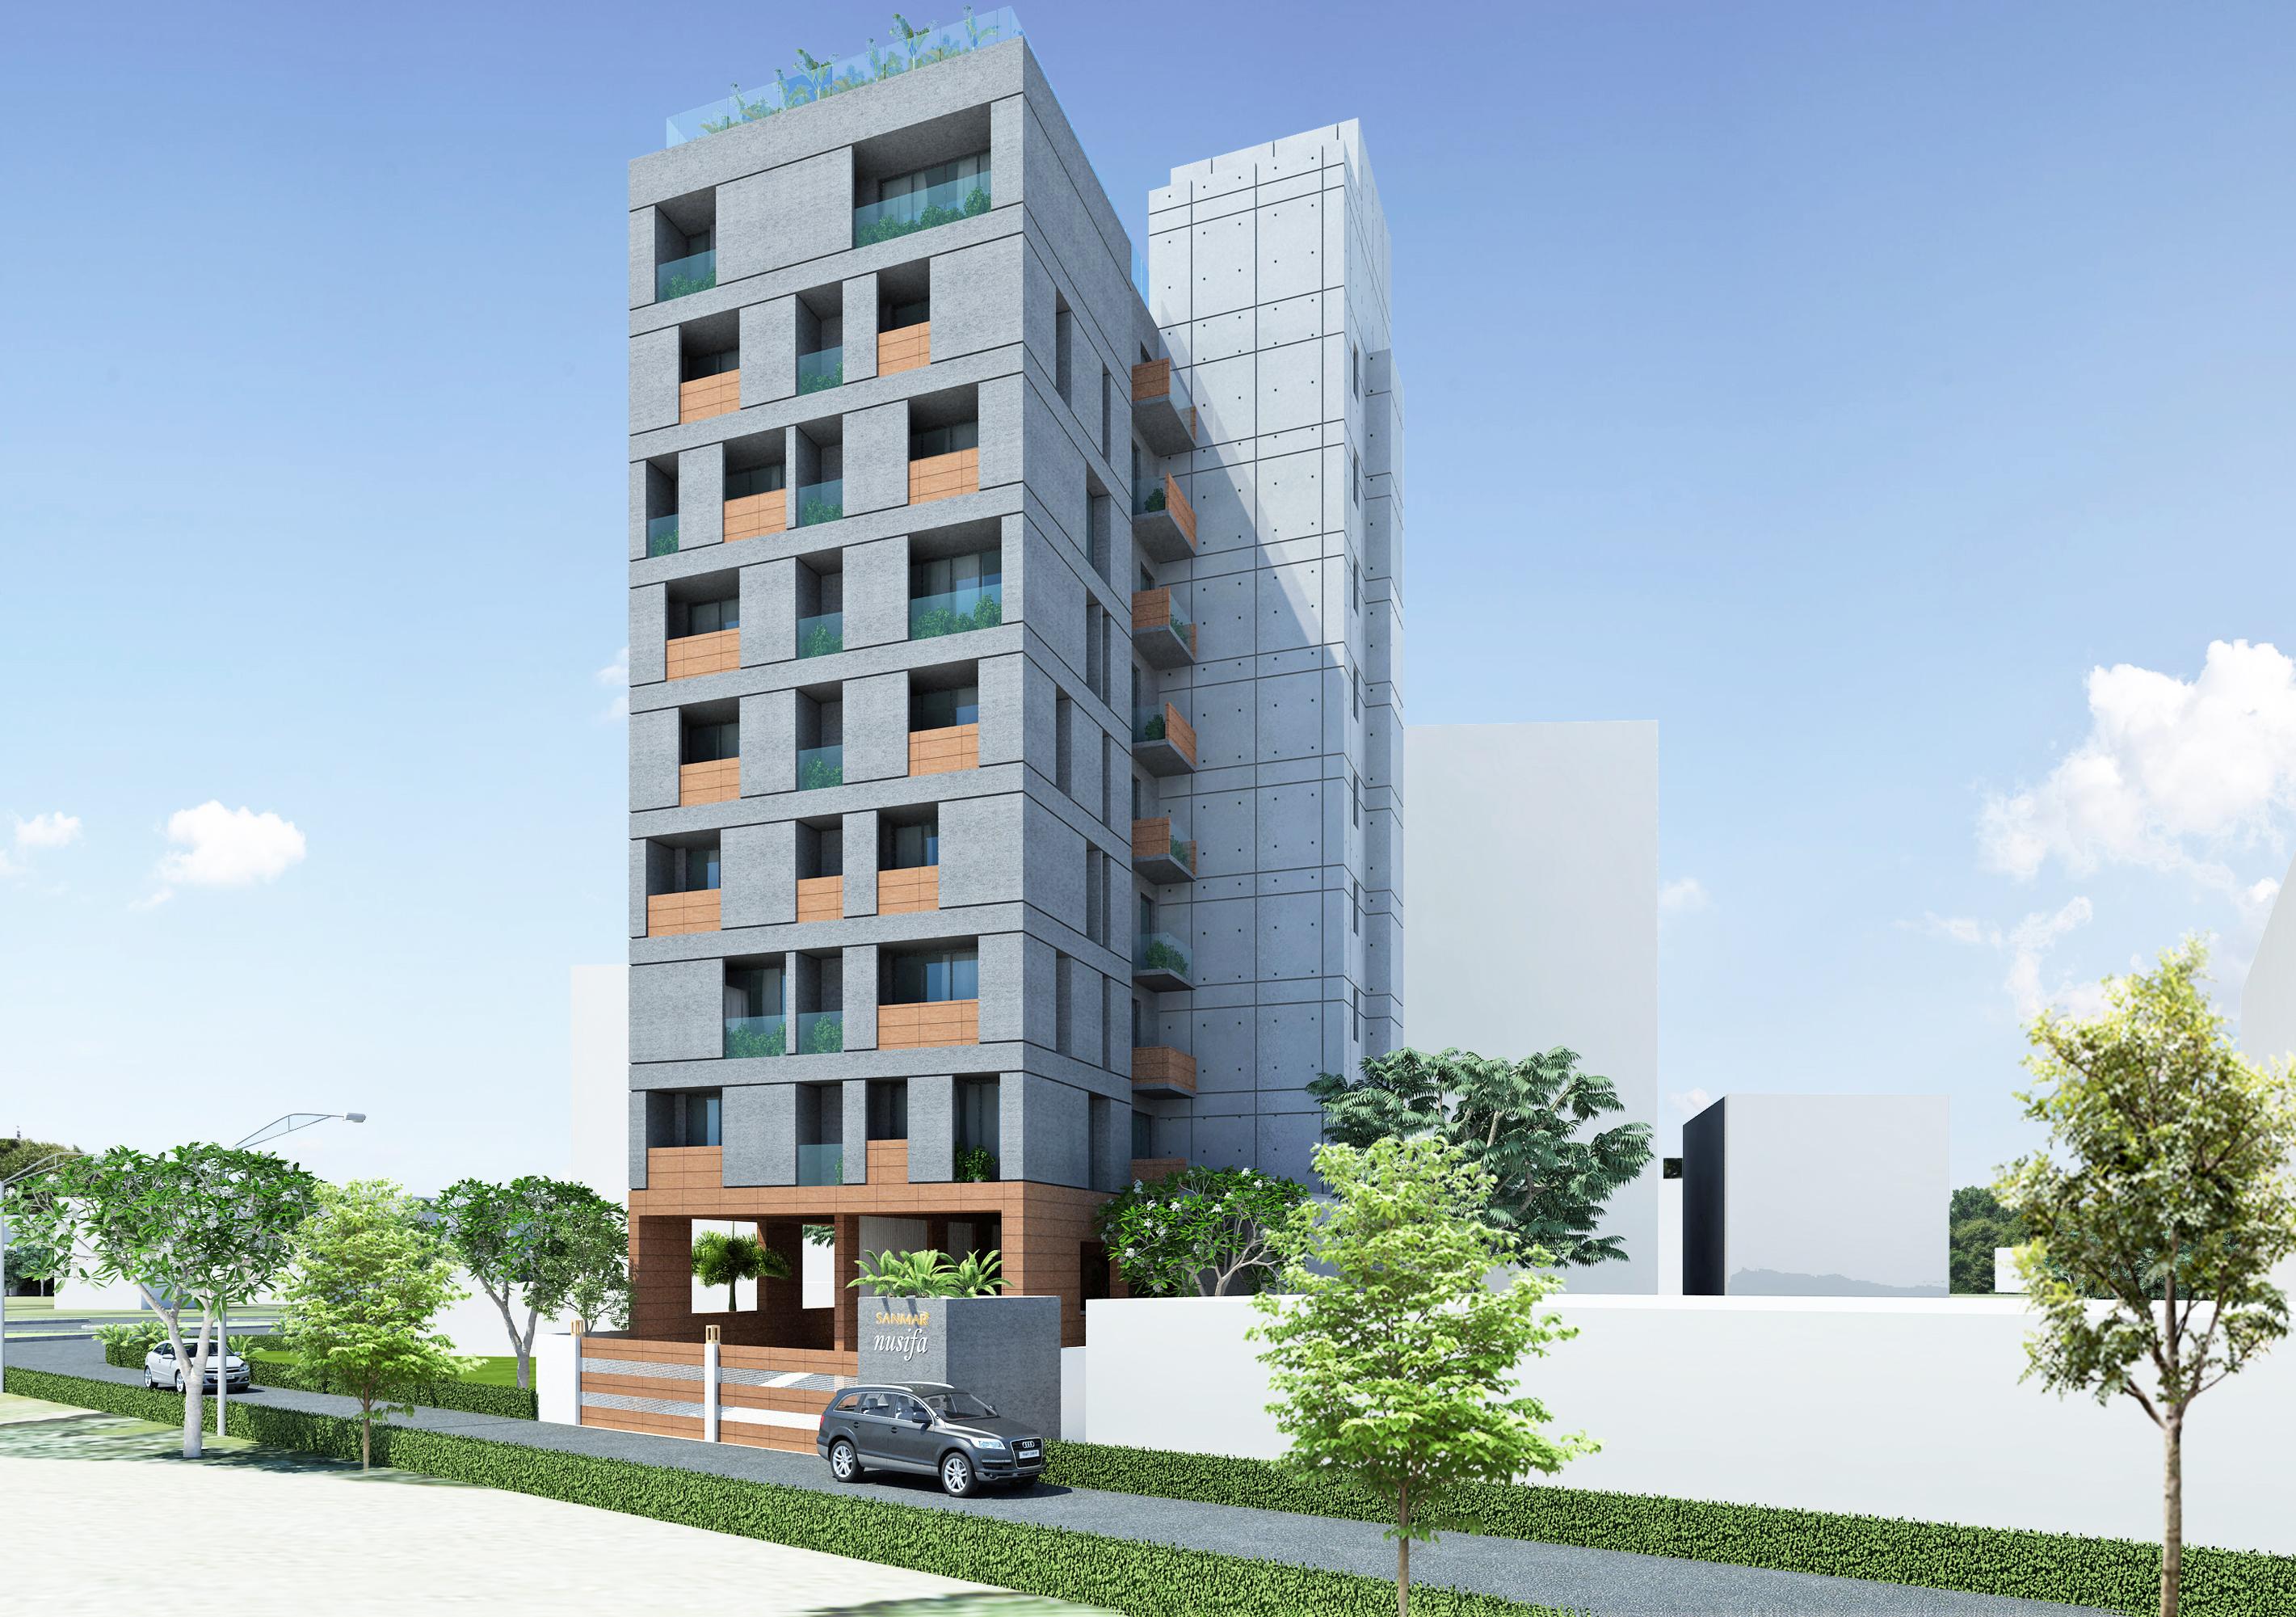 Nusifa Housing